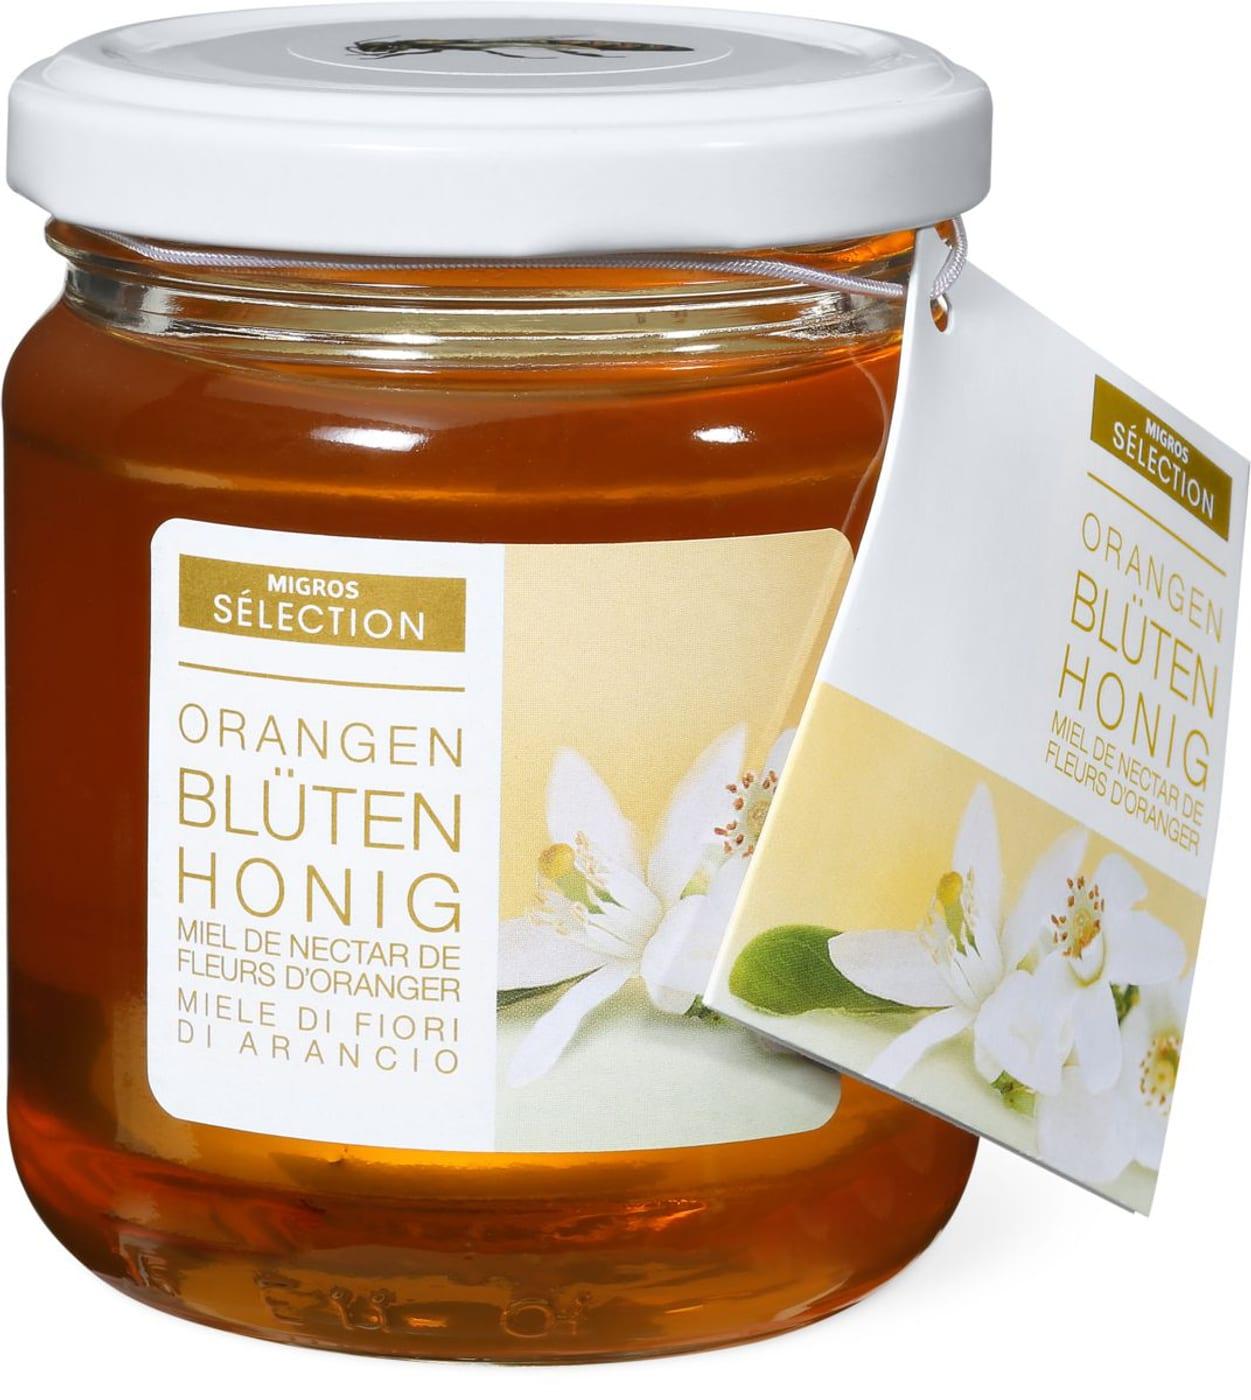 miel d'acacia migros